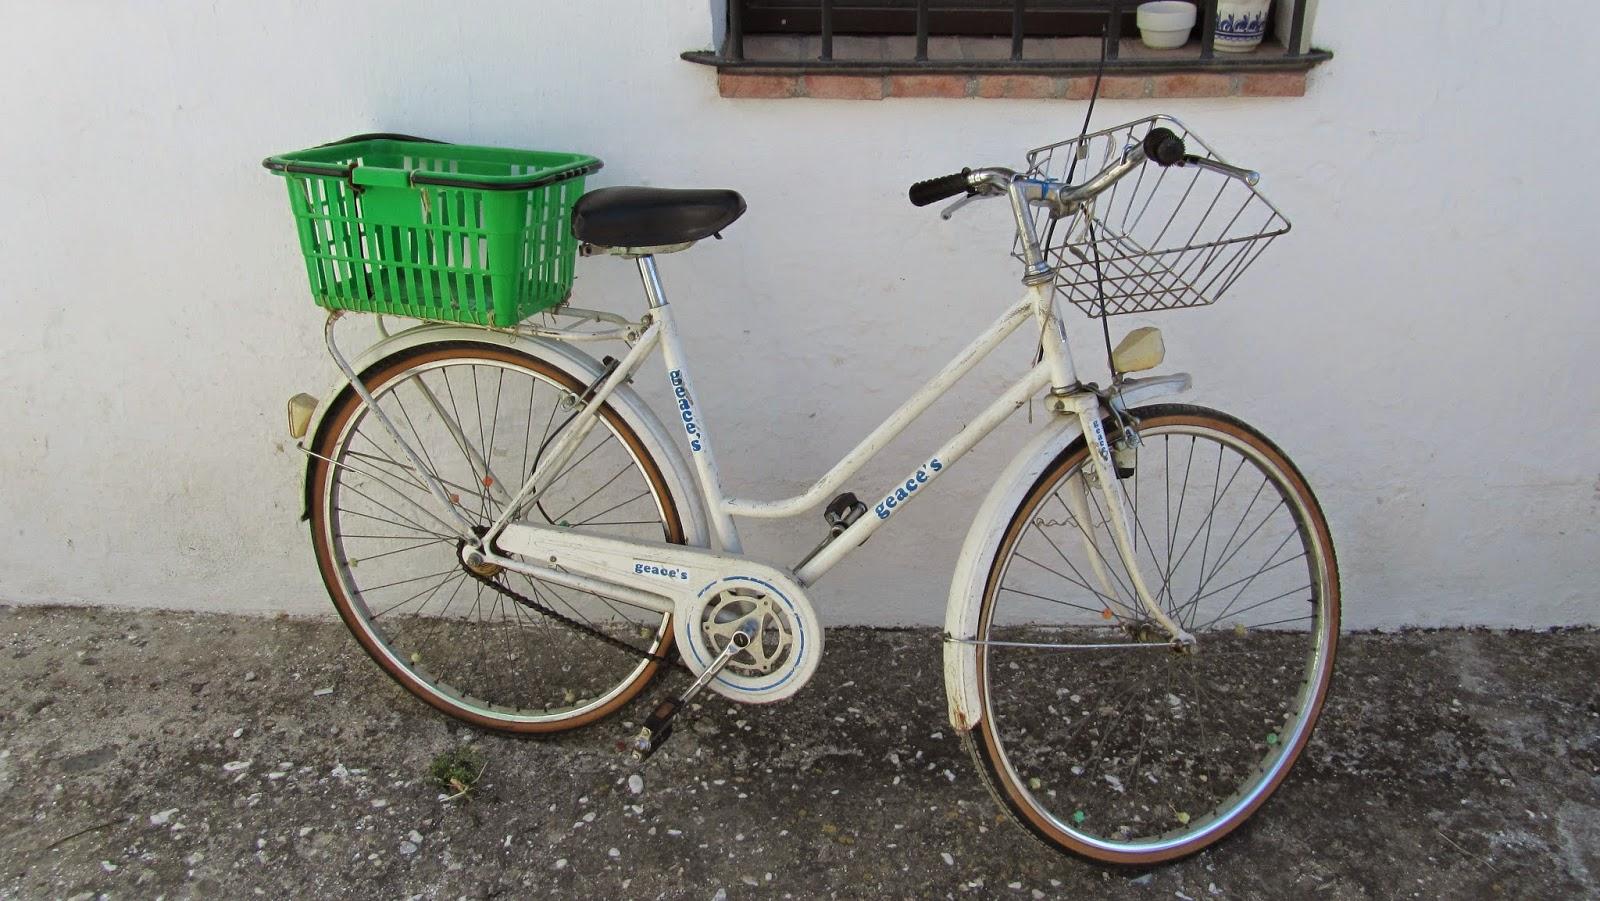 Restaurando una bicicleta G.A.C  de paseo